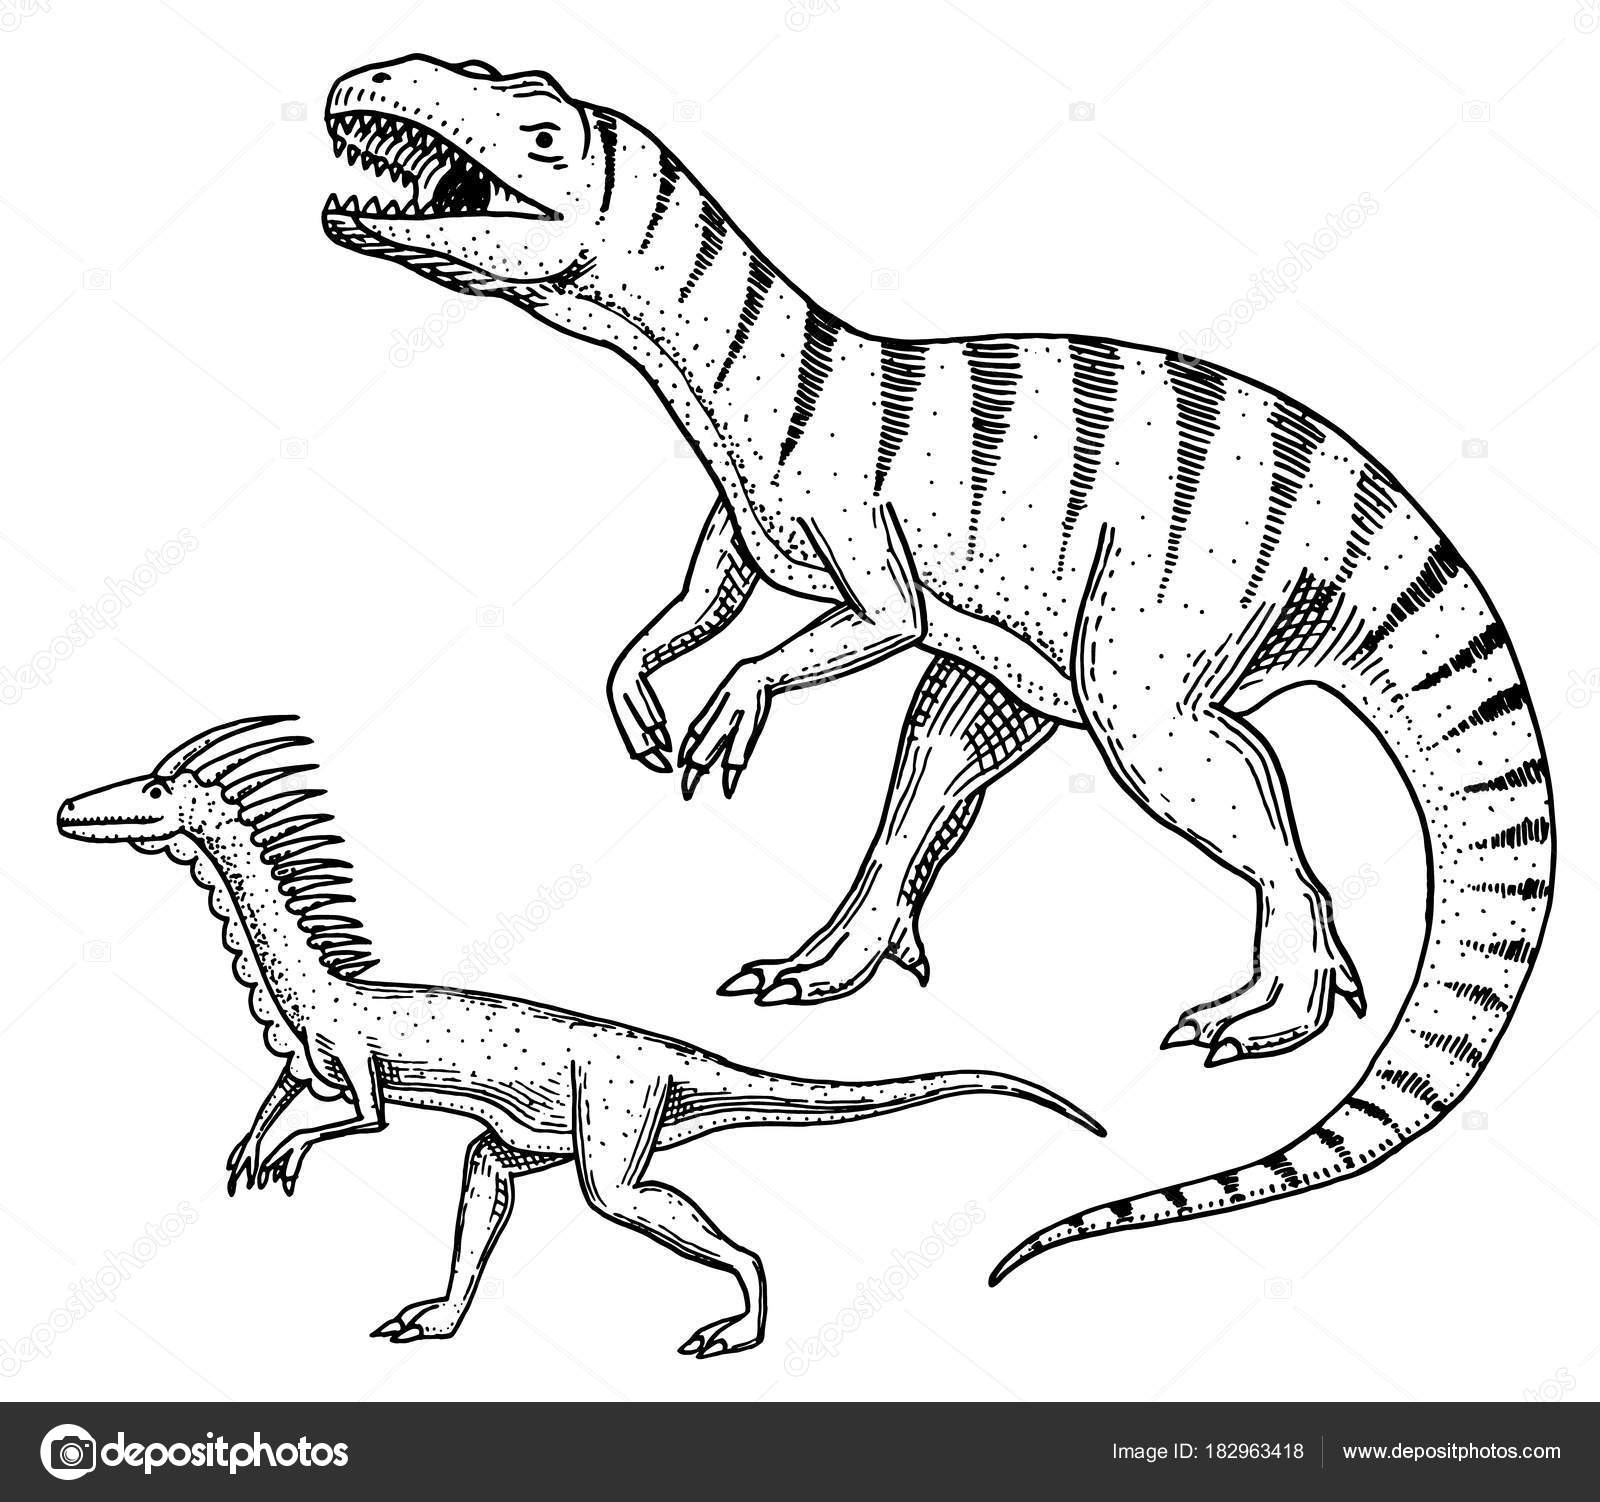 1600x1502 Dinosaurs Tyrannosaurus Rex, Velociraptor, Ceratosaurus